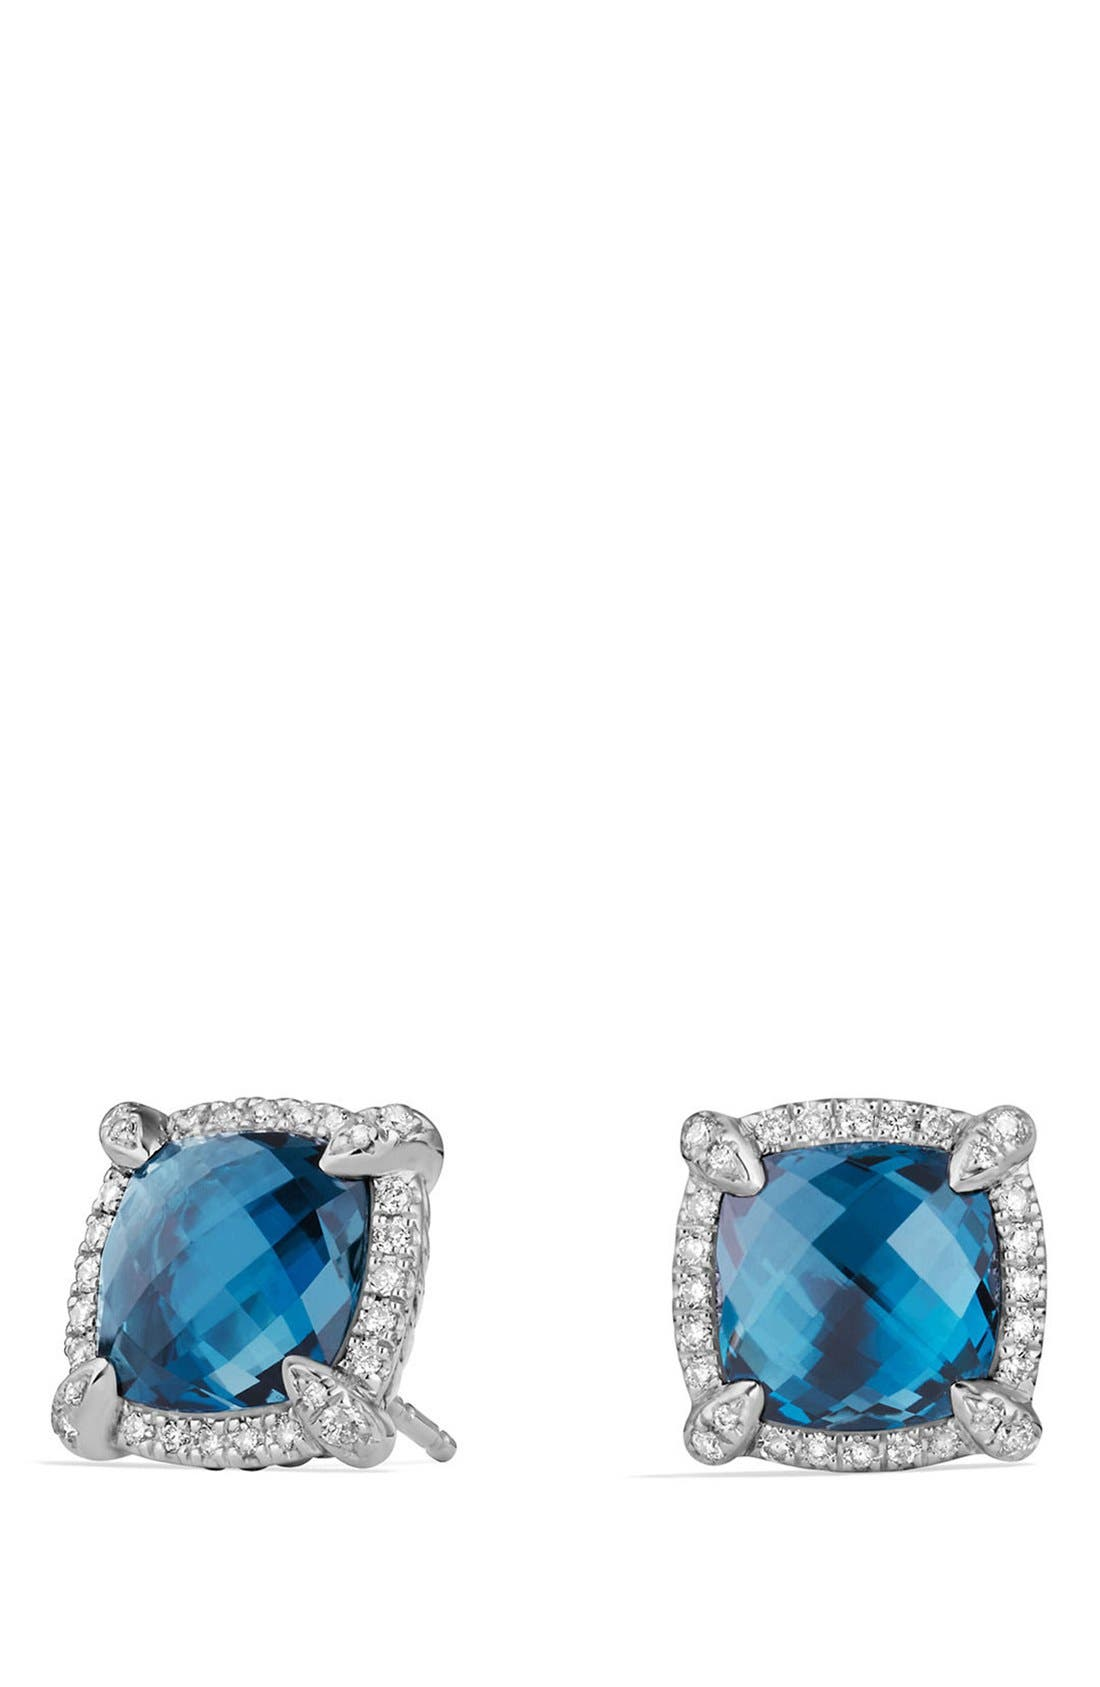 Alternate Image 1 Selected - David Yurman 'Châtelaine' Pavé Bezel Stud Earrings with Diamonds